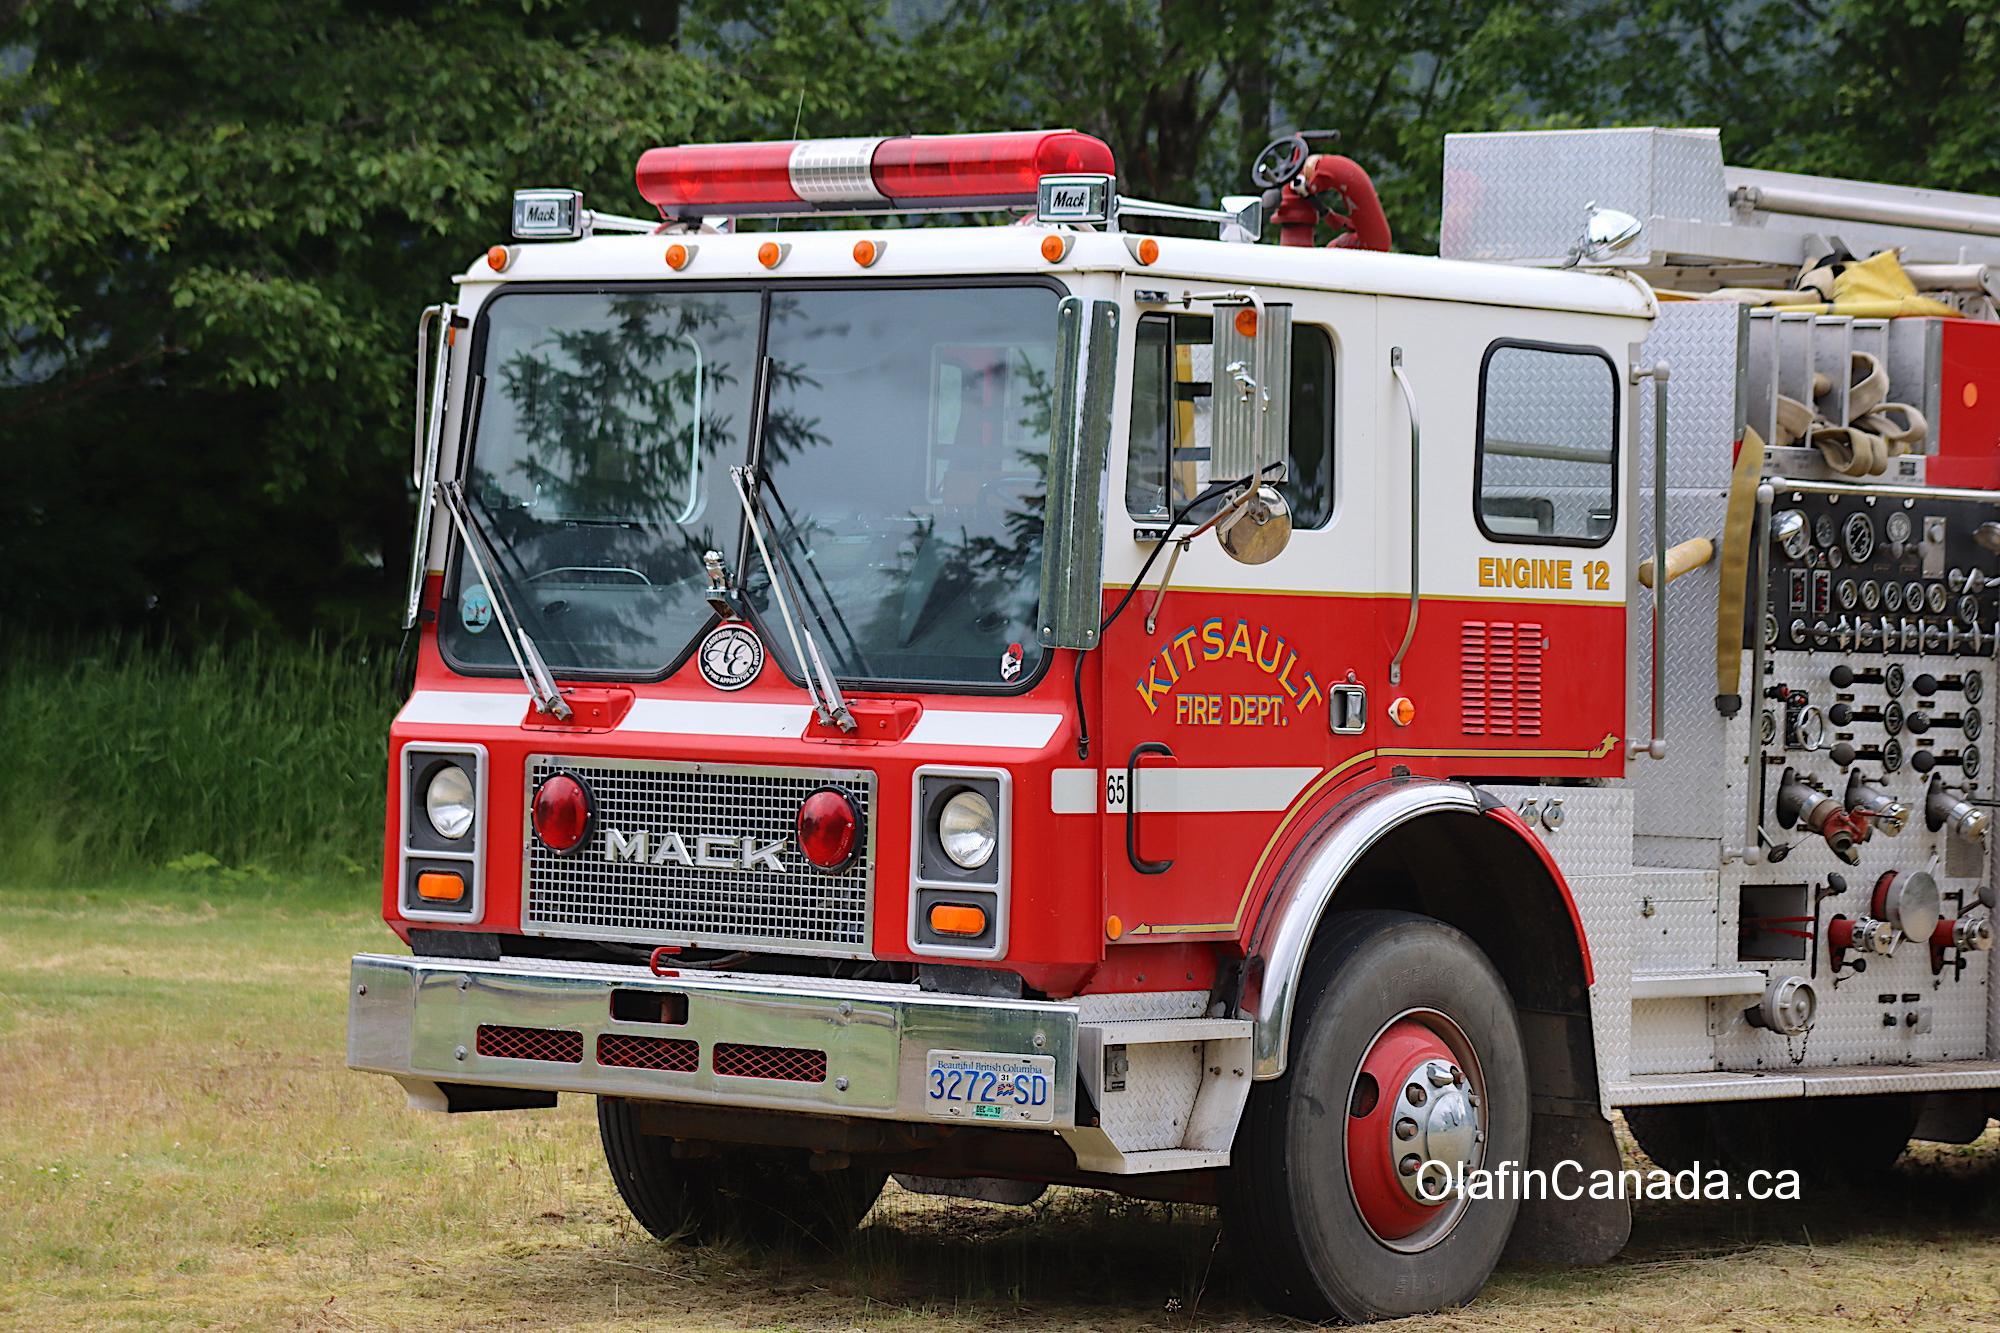 This fire truck still runs in Kitsault #olafincanada #britishcolumbia #discoverbc #abandonedbc #kitsault